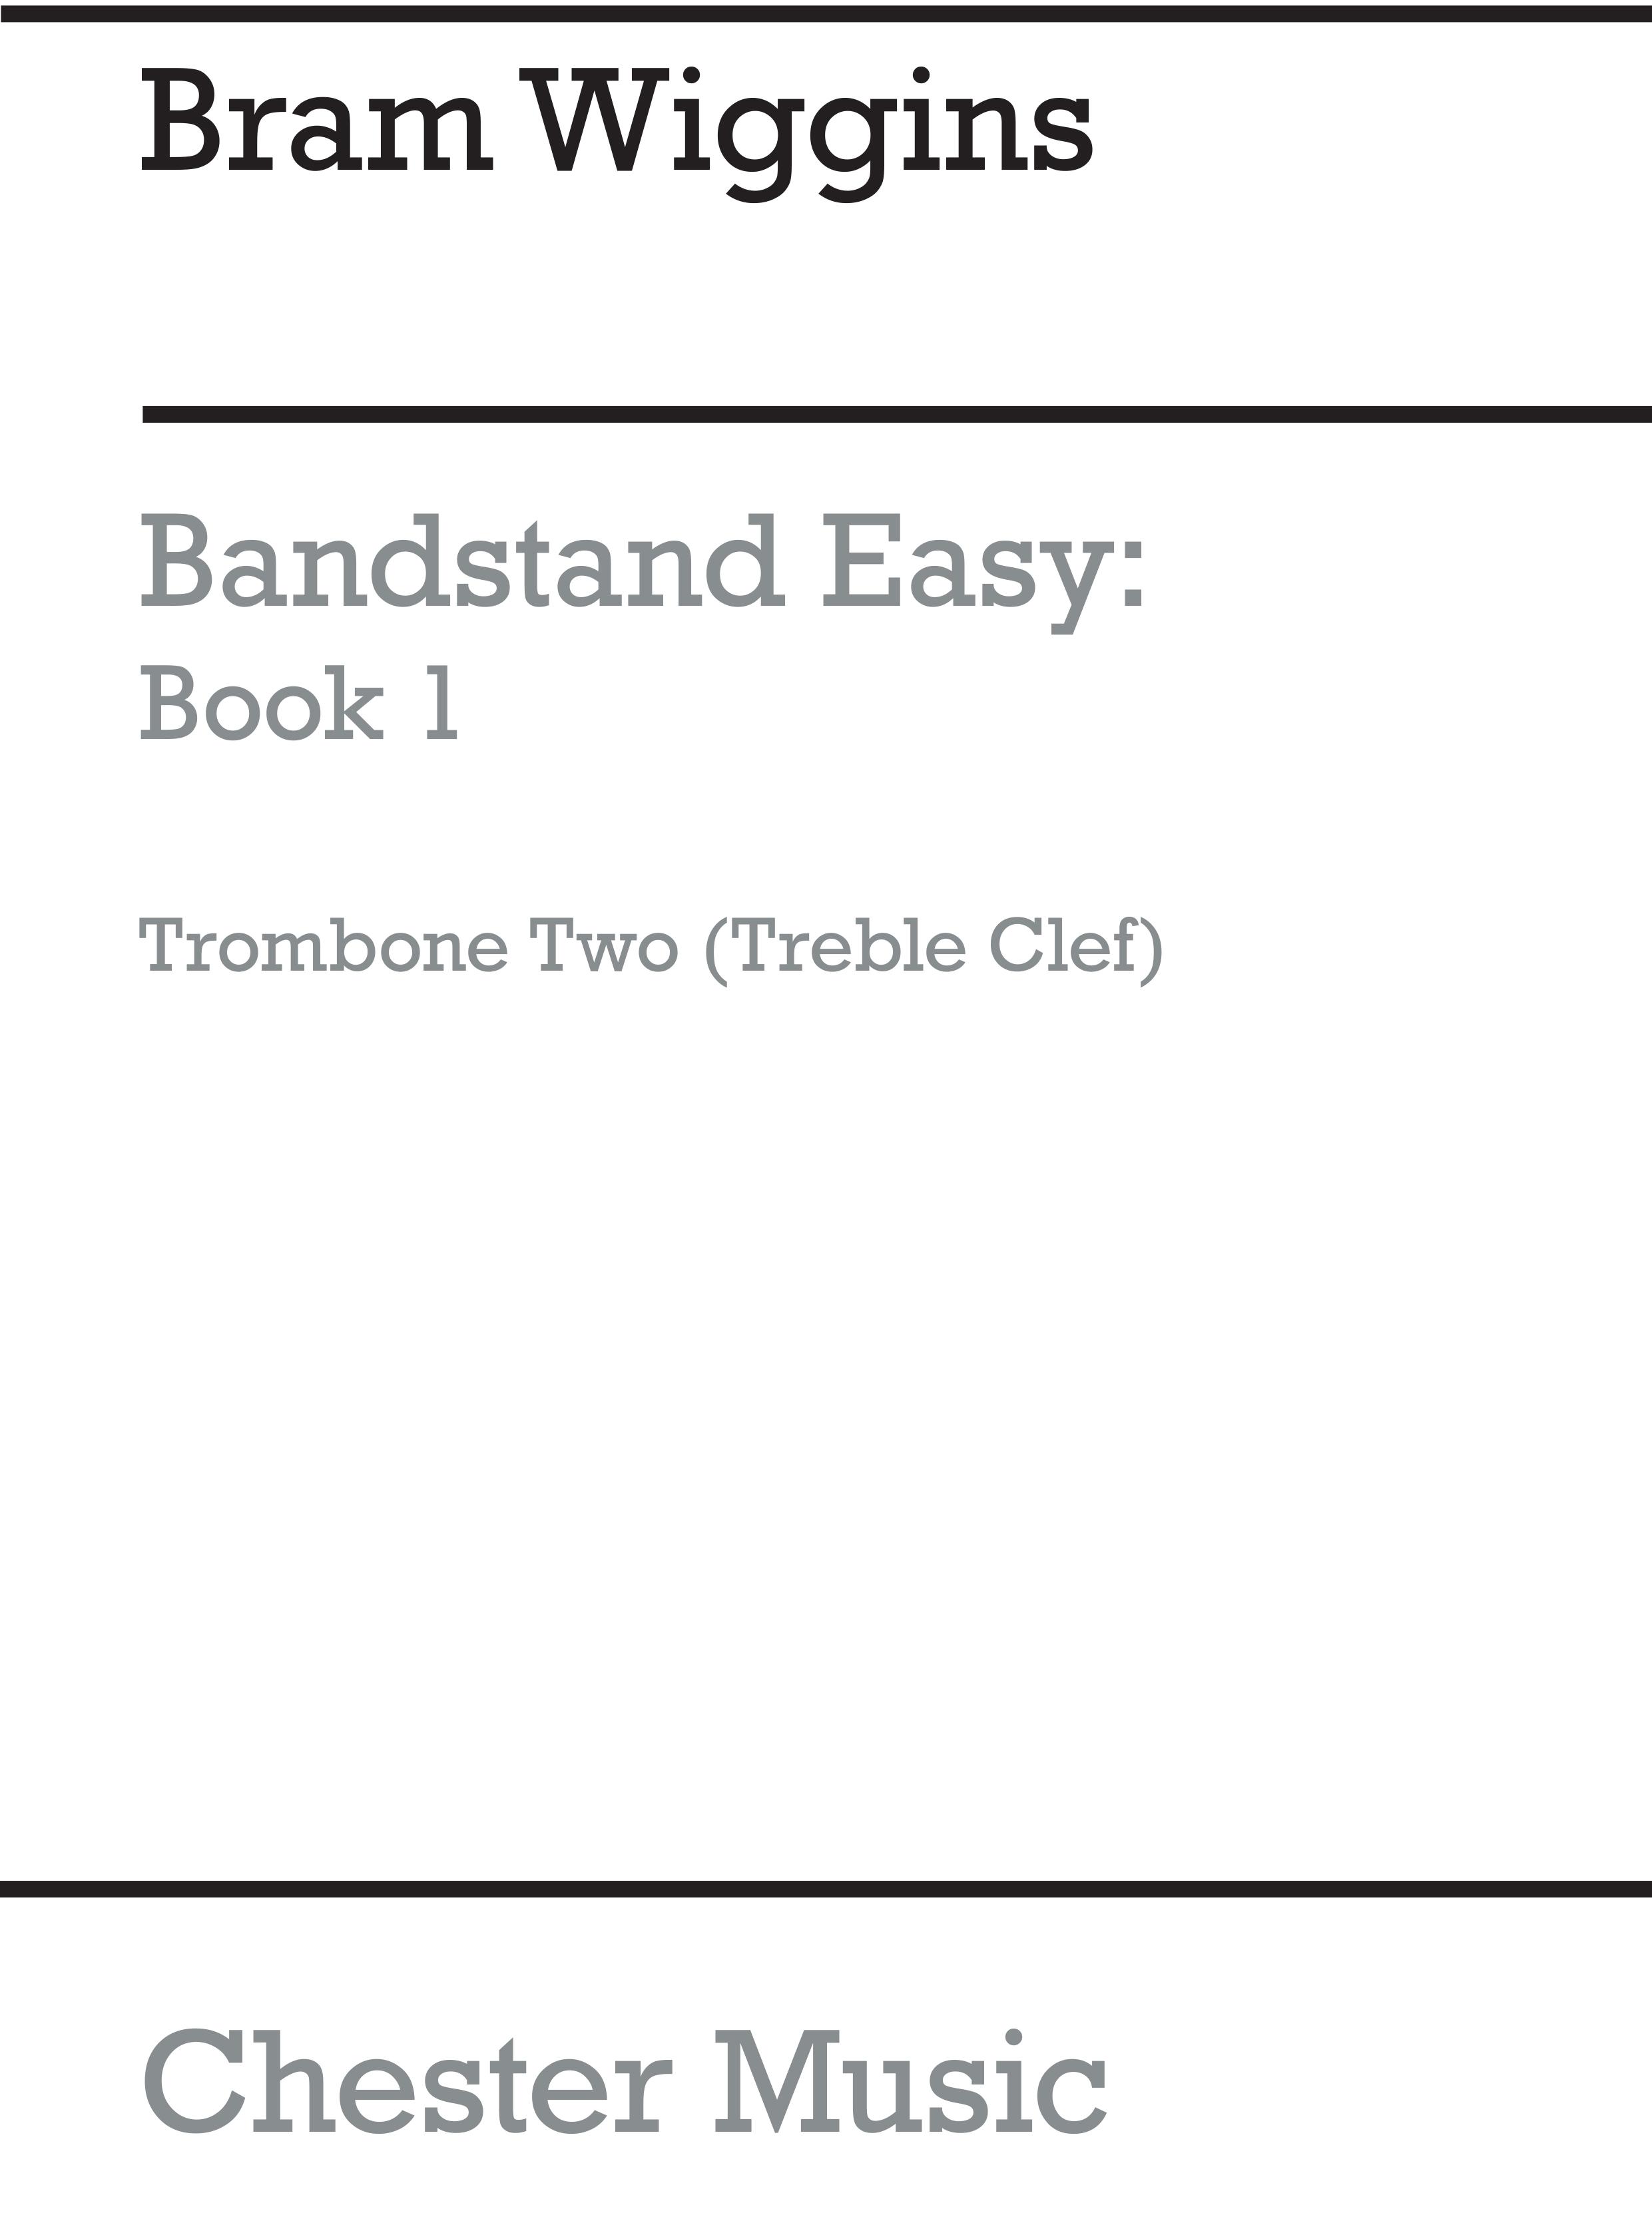 Bram Wiggins: Bandstand Easy Book 1 (Trombone 2 TC): Concert Band: Part